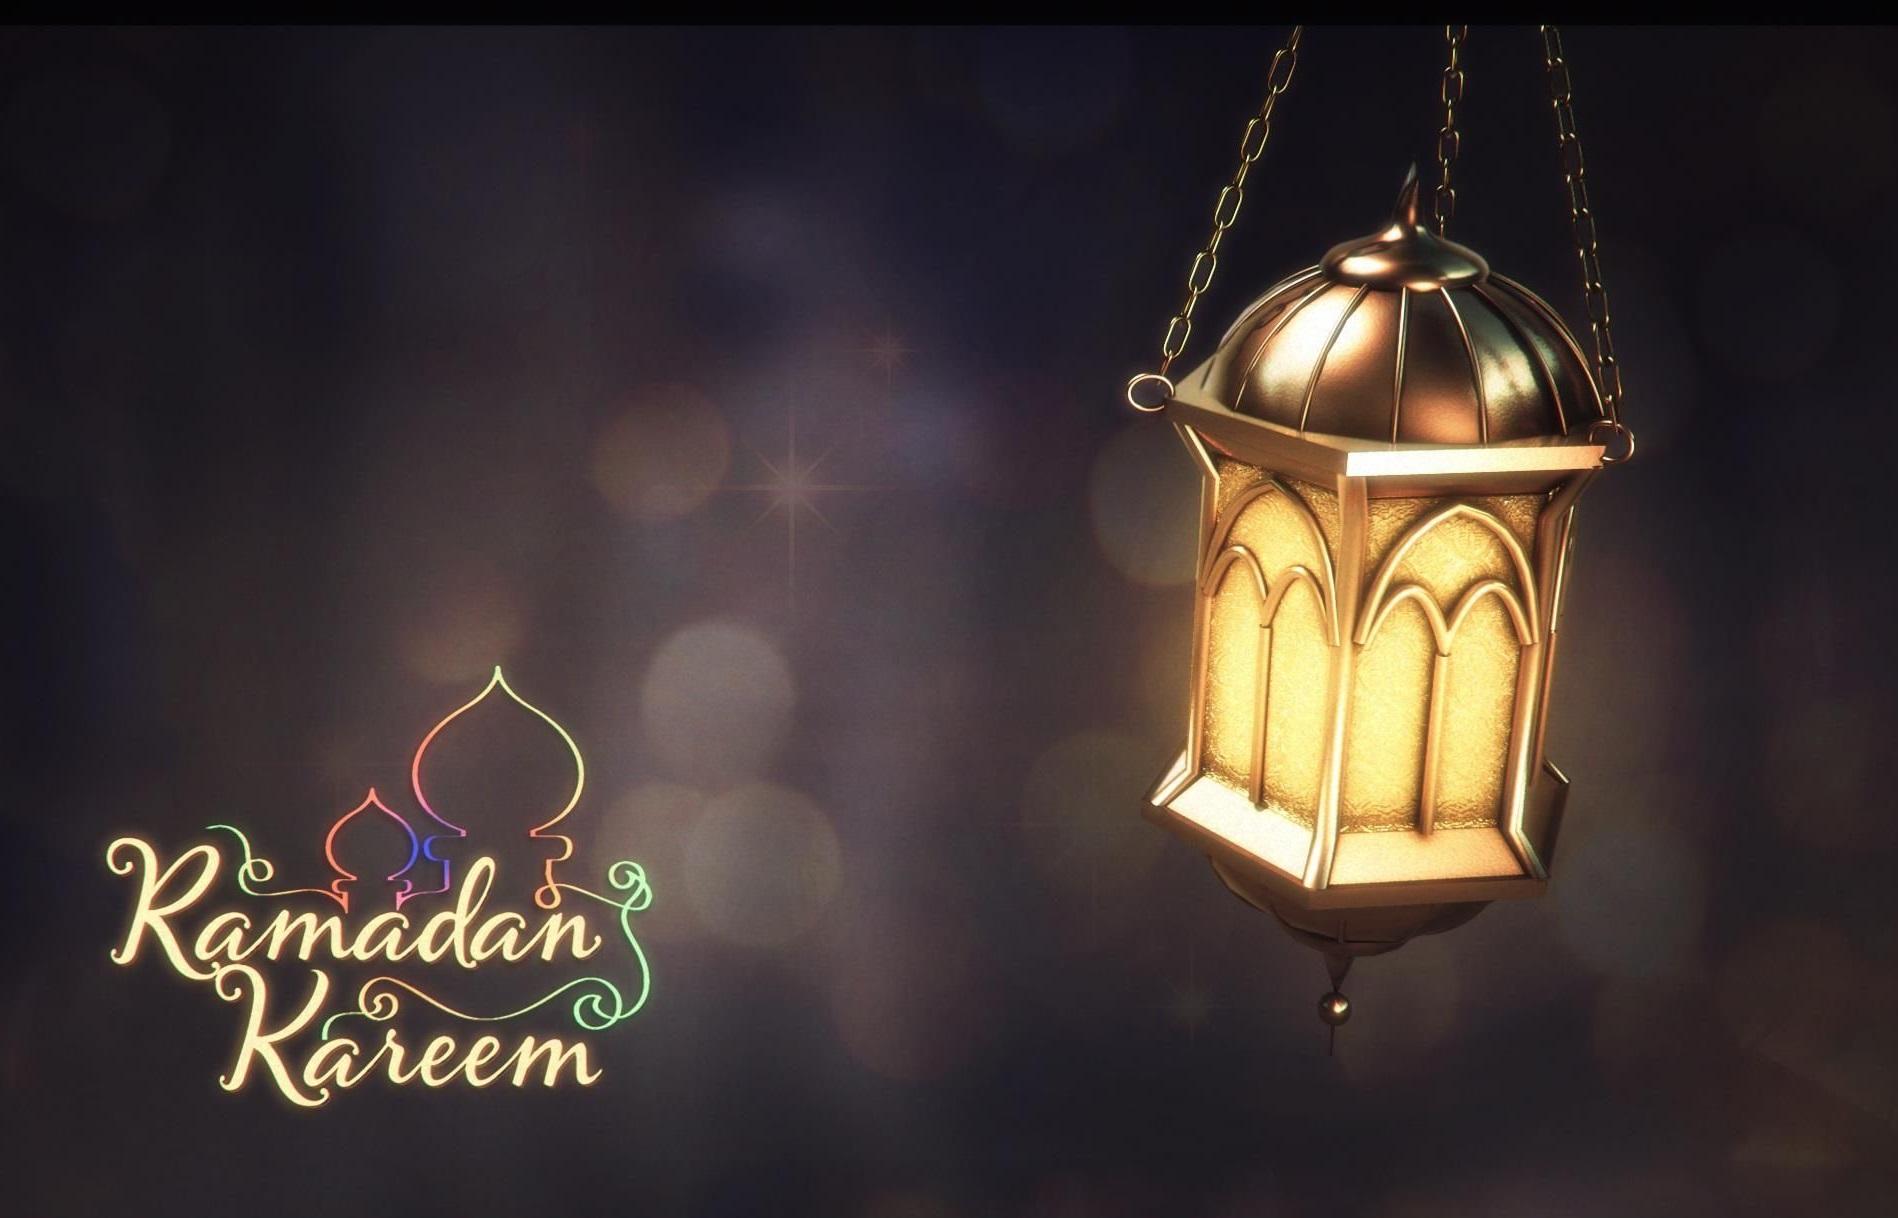 Ramadan Kareem with Arabian Lantern Islamic Greeting Cards and Wallpapers 001